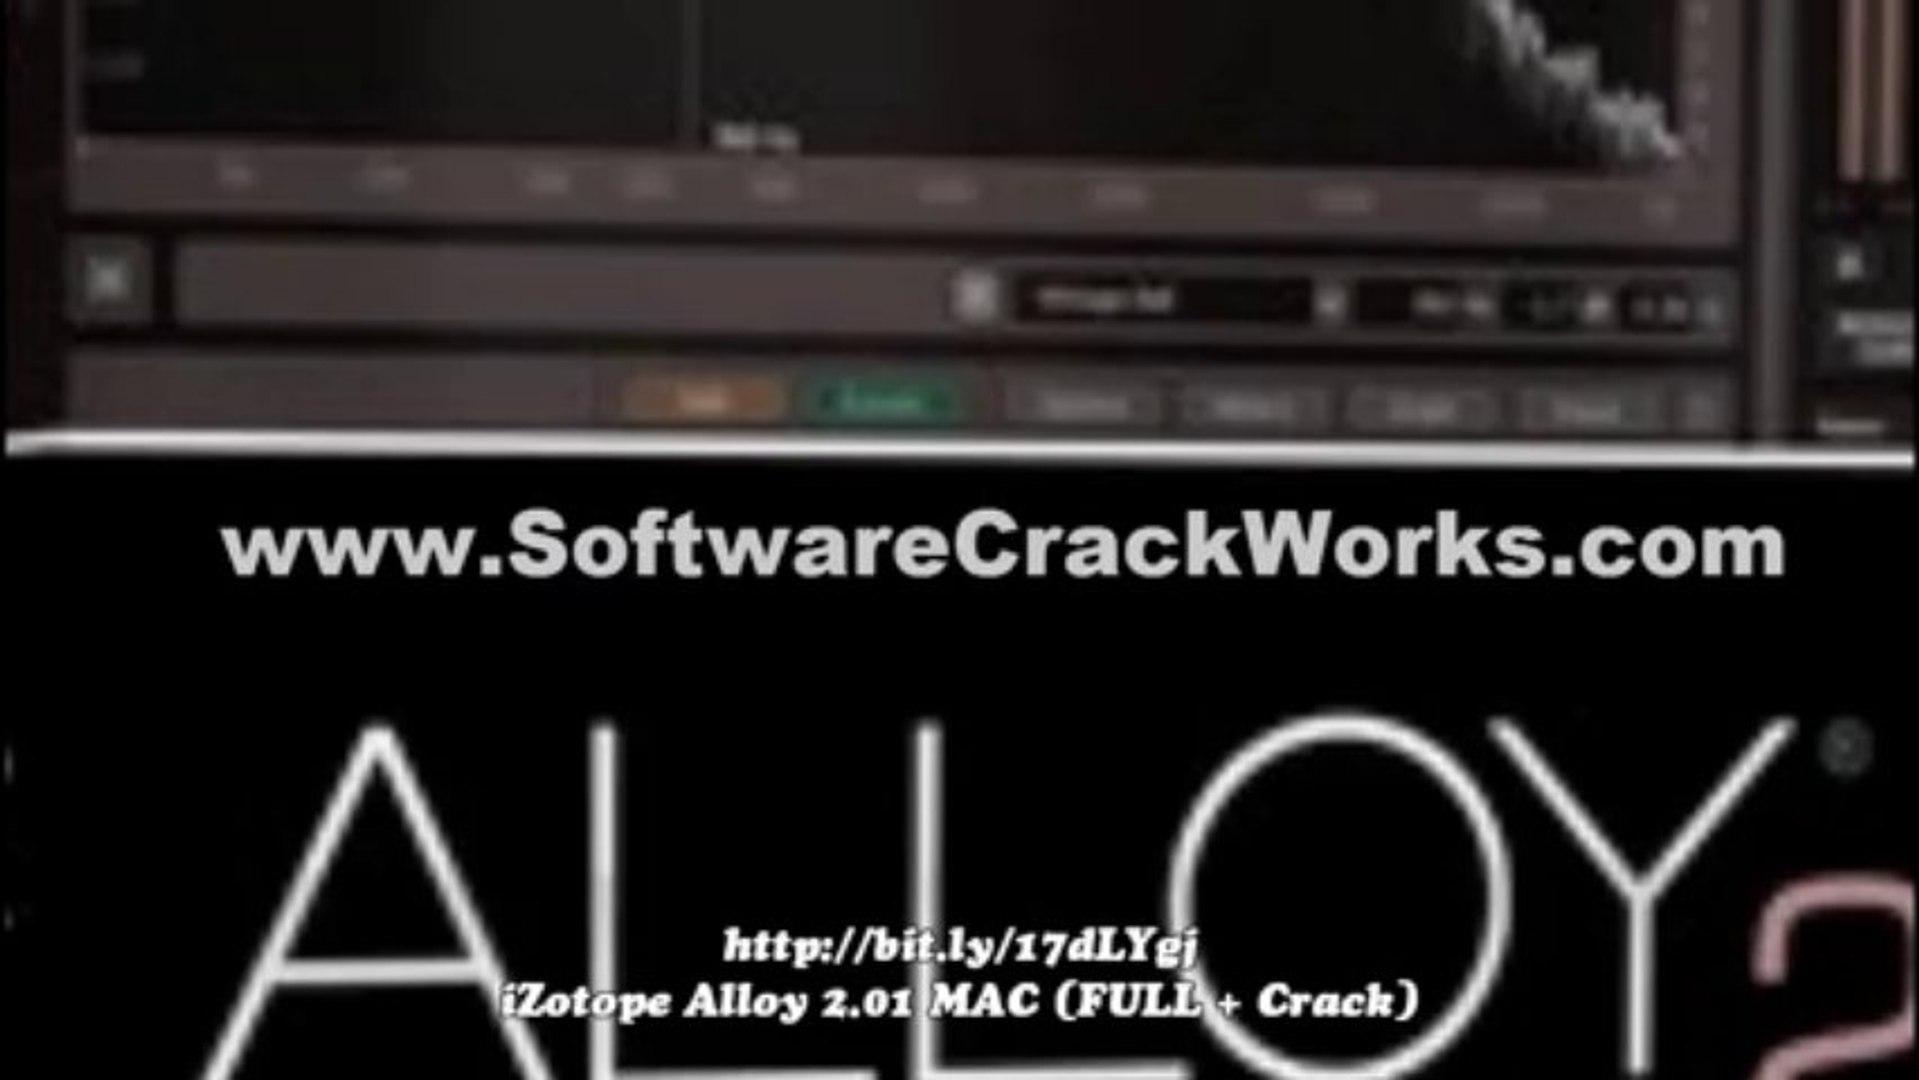 [8-2013 NEW] (FULL + Crack) iZotope Alloy 2 01 {MAC}